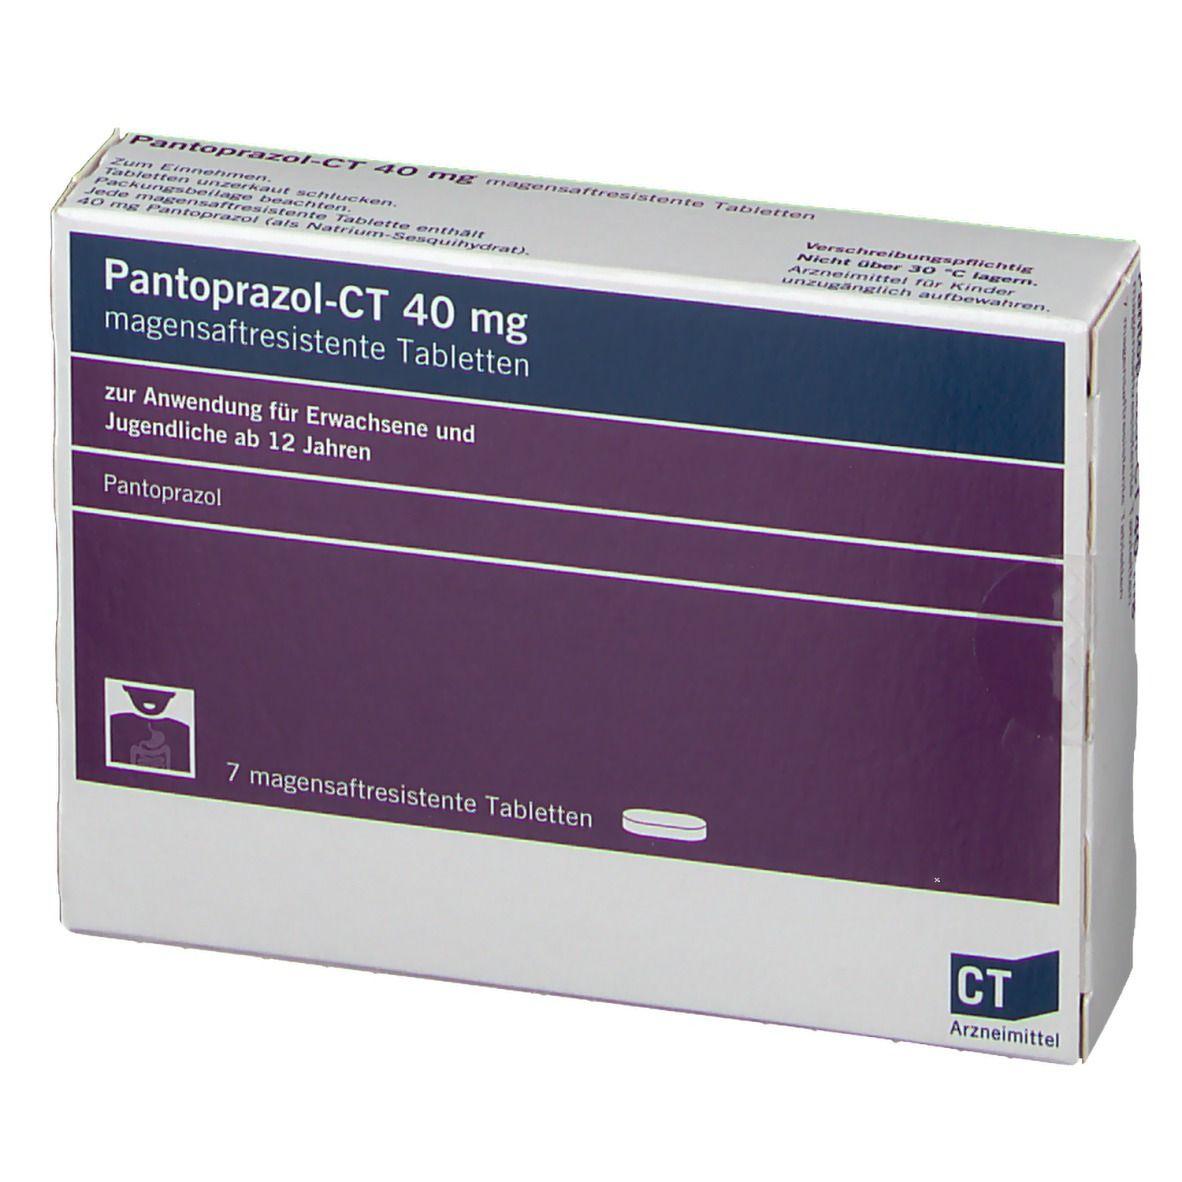 PANTOPRAZOL-CT 40 mg magensaftresistente Tabletten